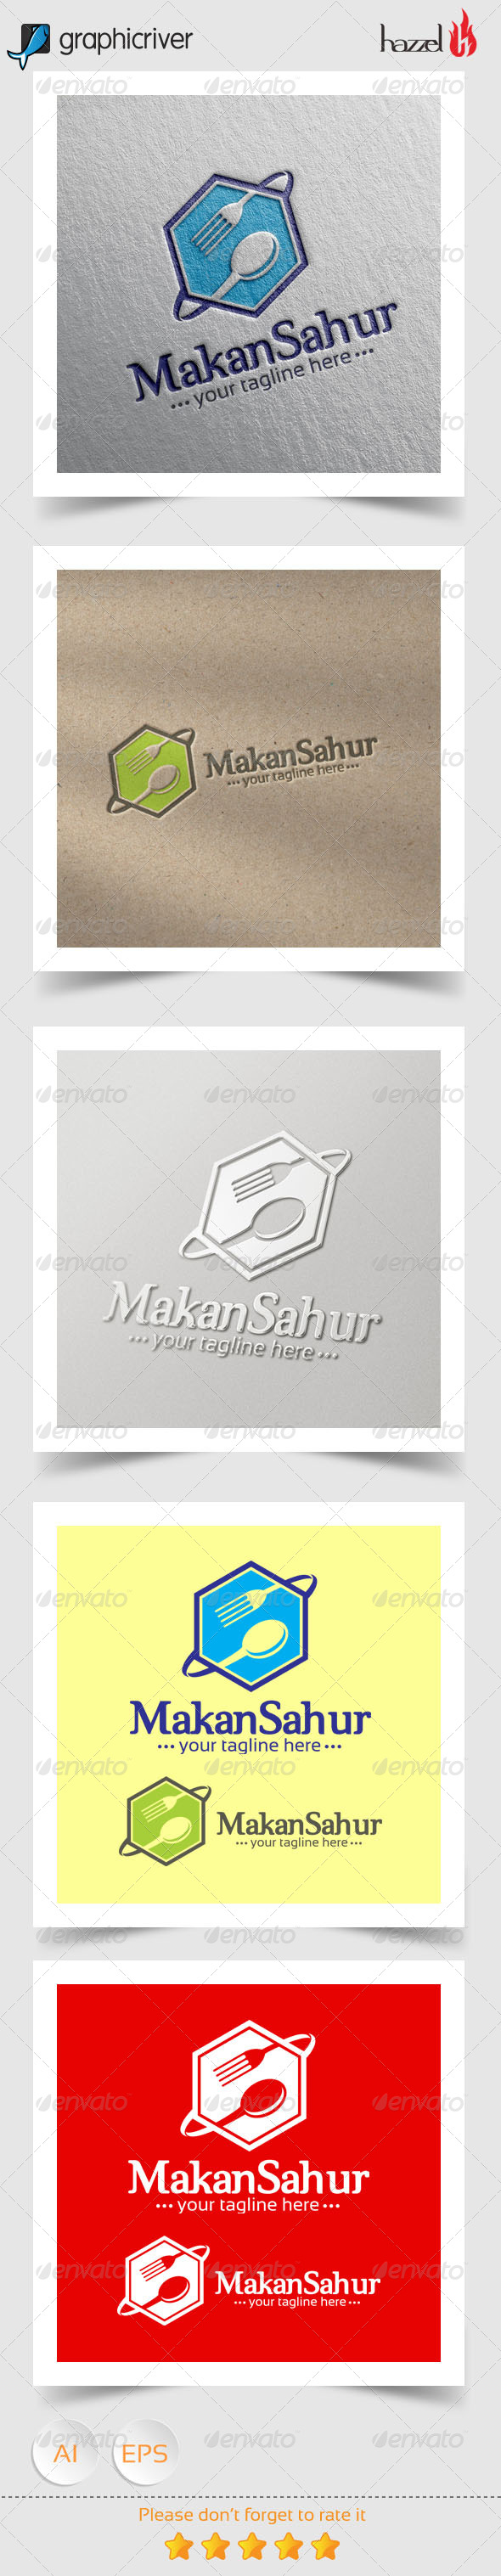 GraphicRiver Makan Sahur Logo 8368217